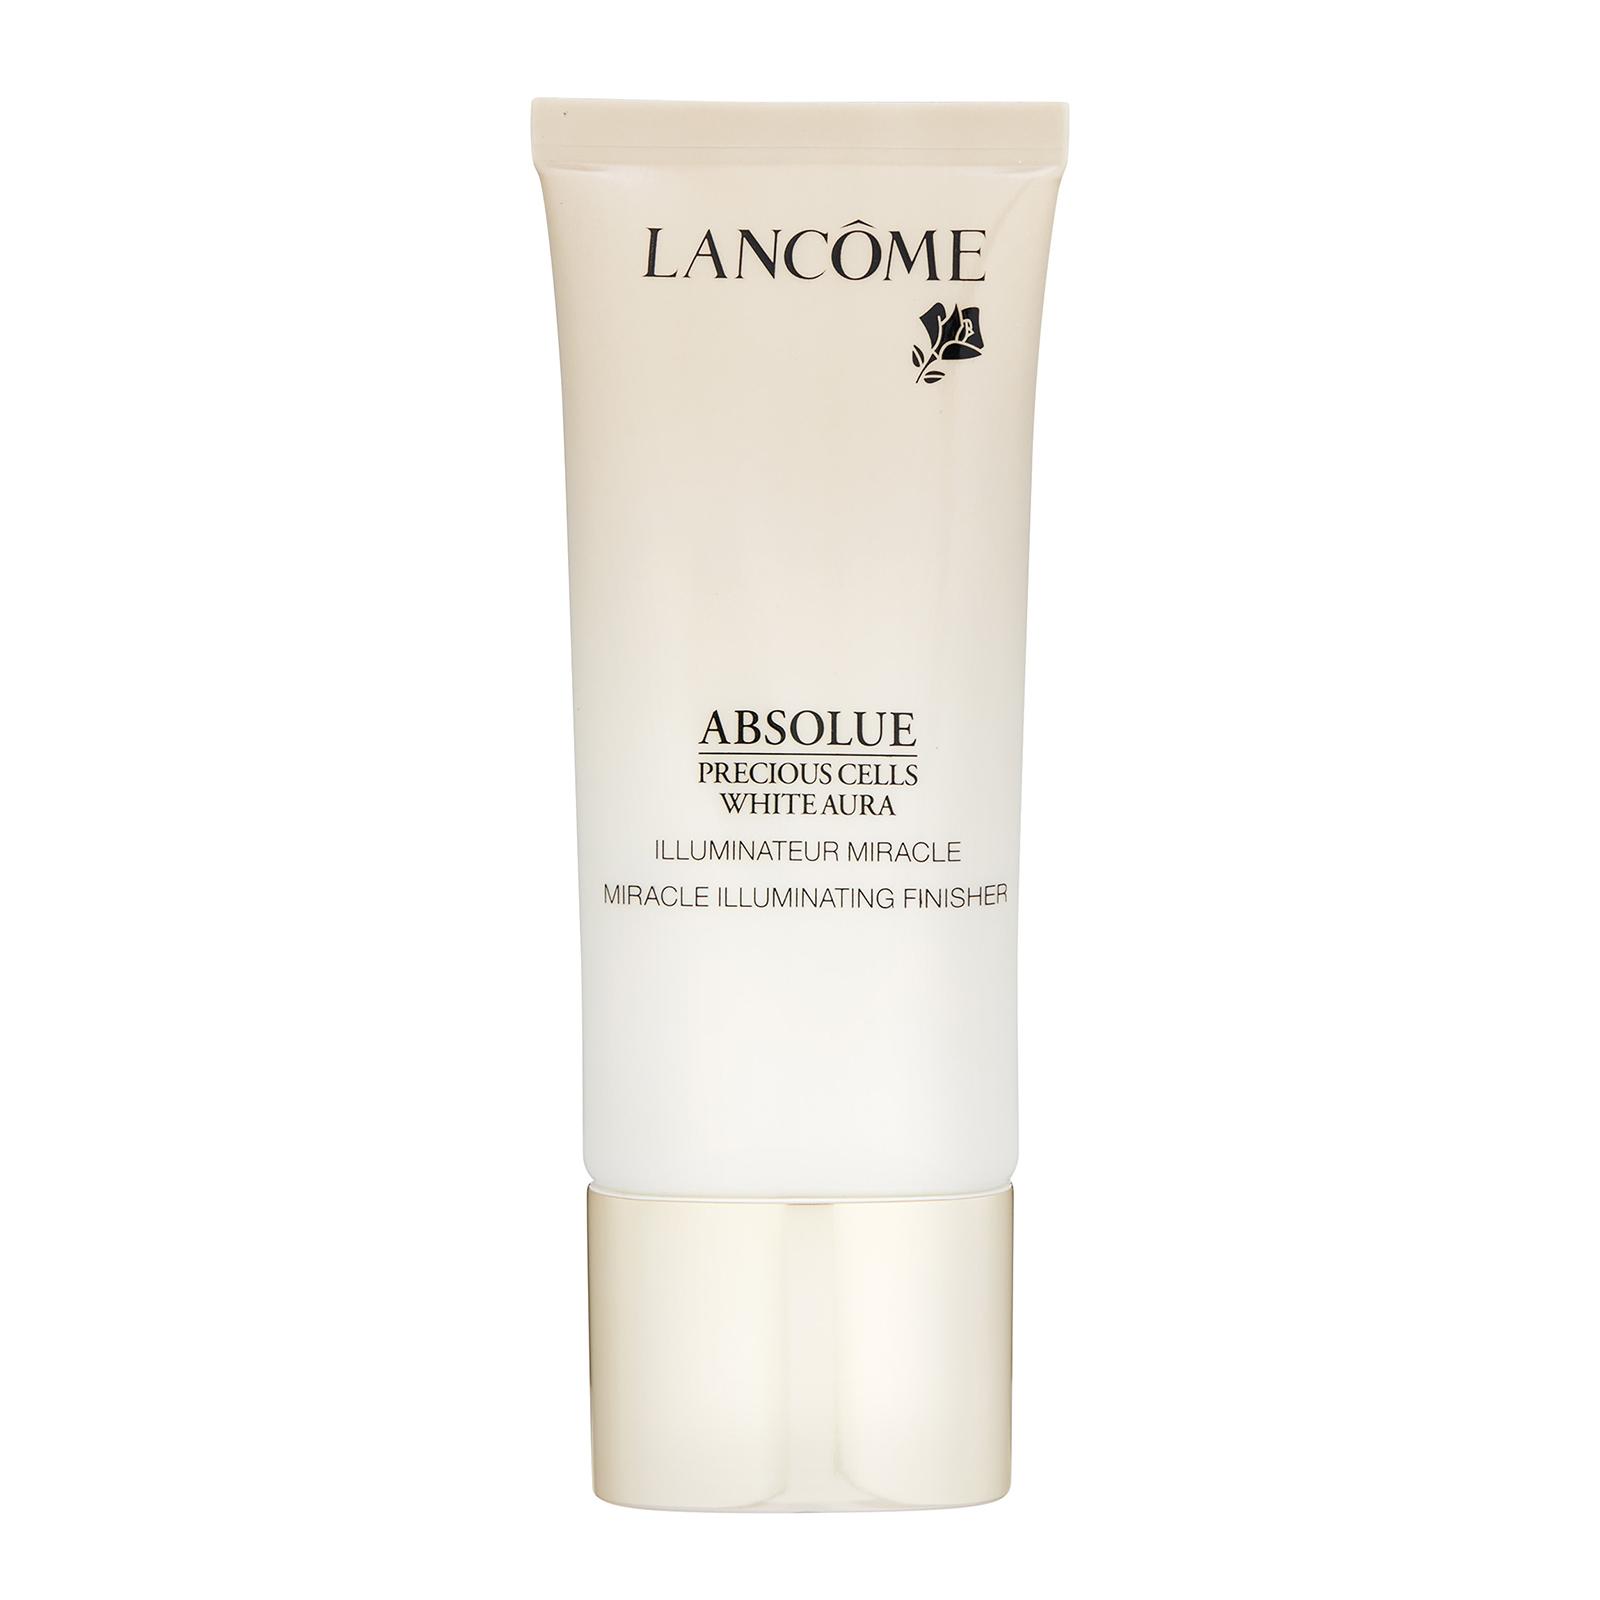 LANCÔME Absolue Precious Cells White Aura  Miracle Illuminating Finisher 30ml,